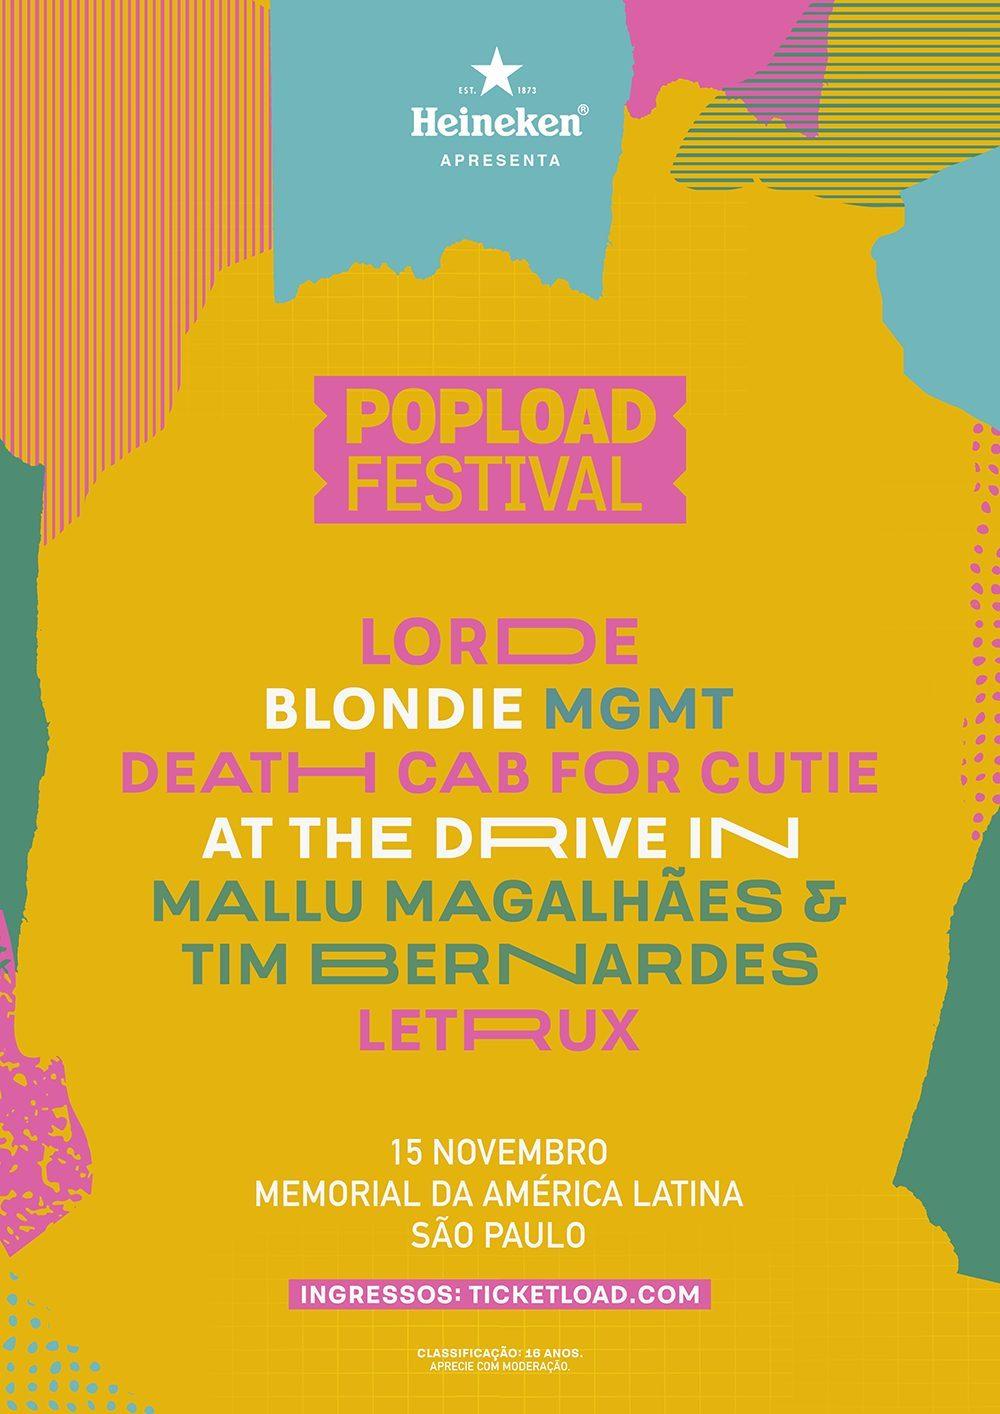 Popload Festival 2018